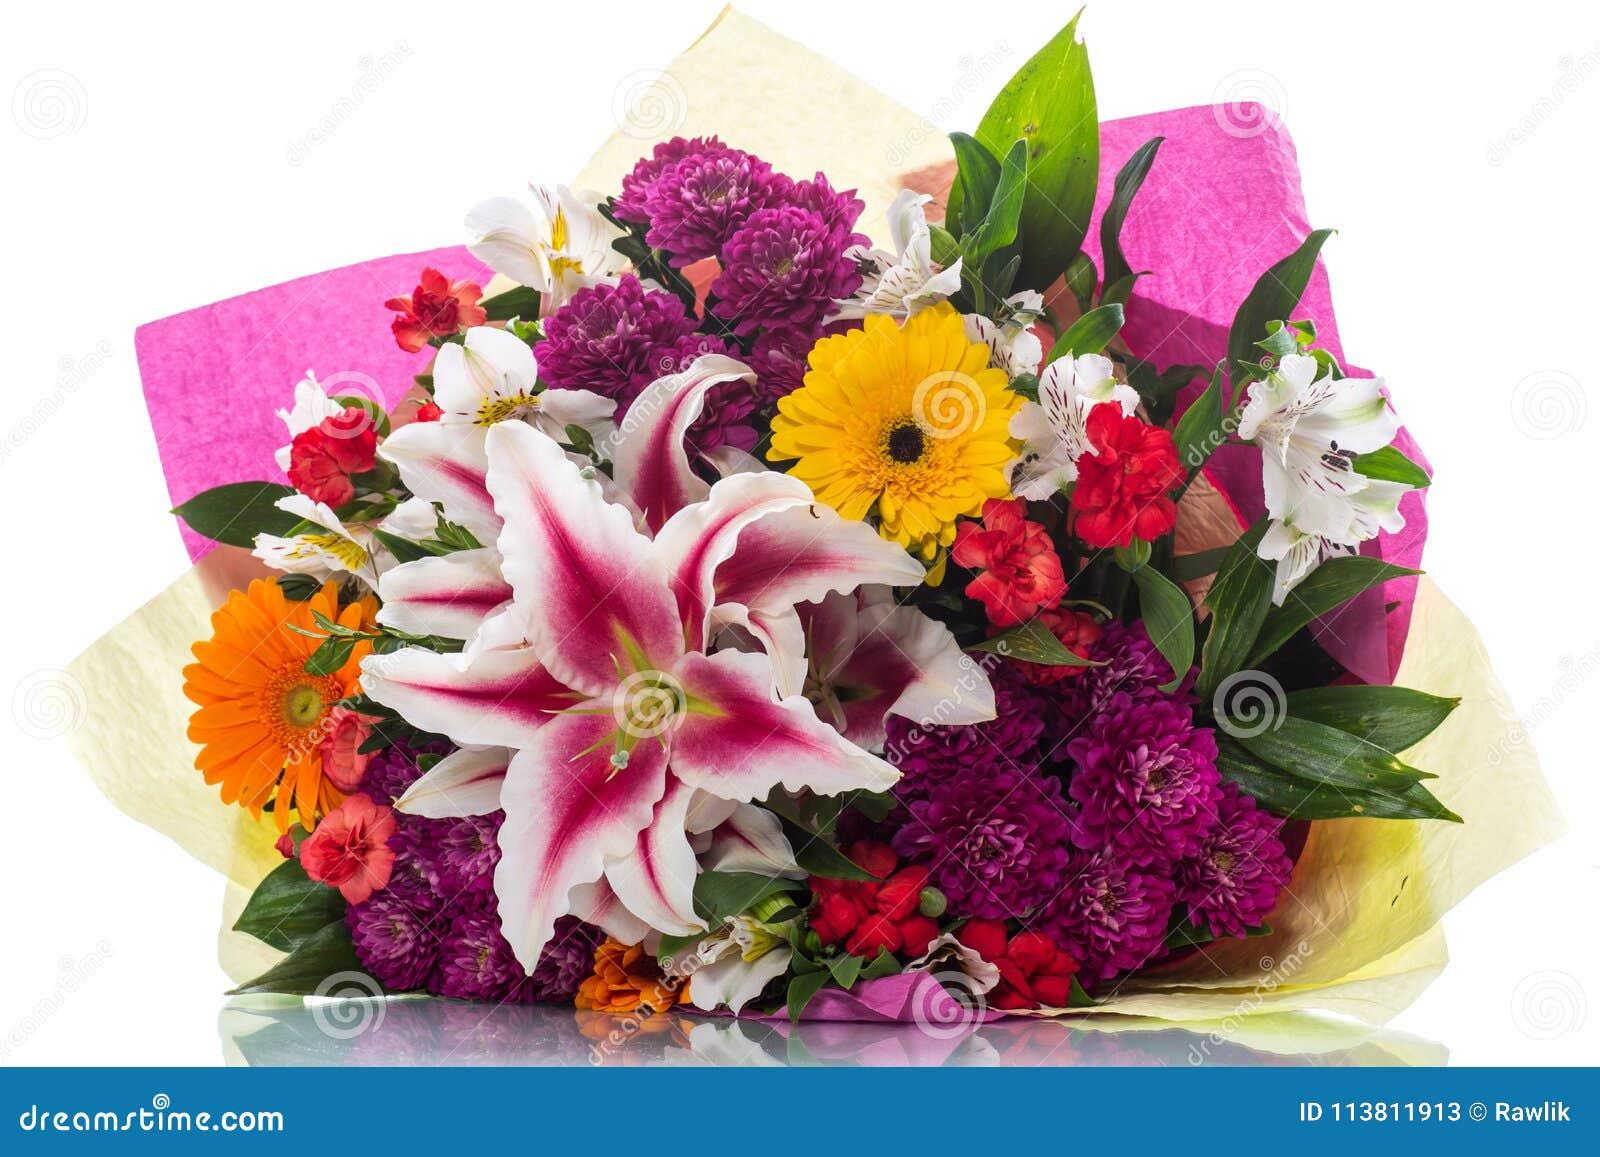 Beautiful bouquet of different flowers stock image image of beautiful bouquet of different flowers izmirmasajfo Gallery